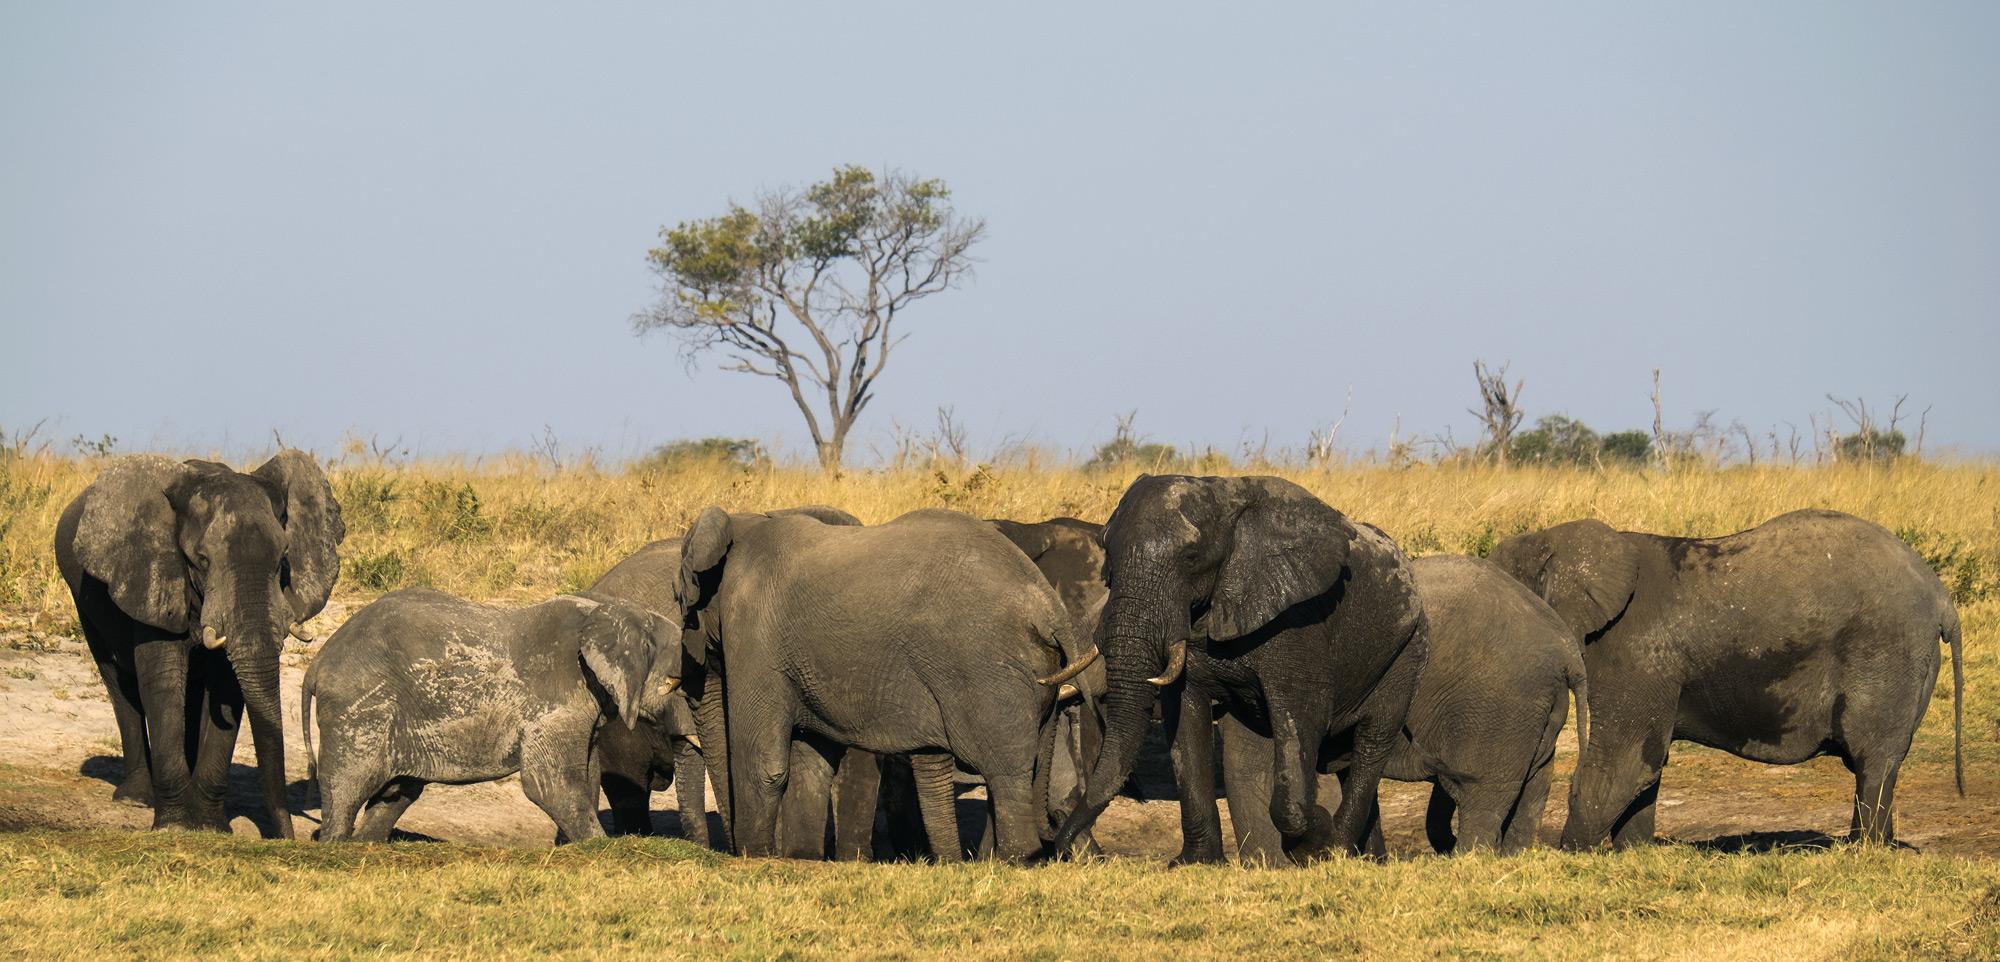 Elephant Gathering, Elephant Sands, Botswana, Africa, waterhole, evening, game drive, dry, wet, filthy, elephant, herd, photo